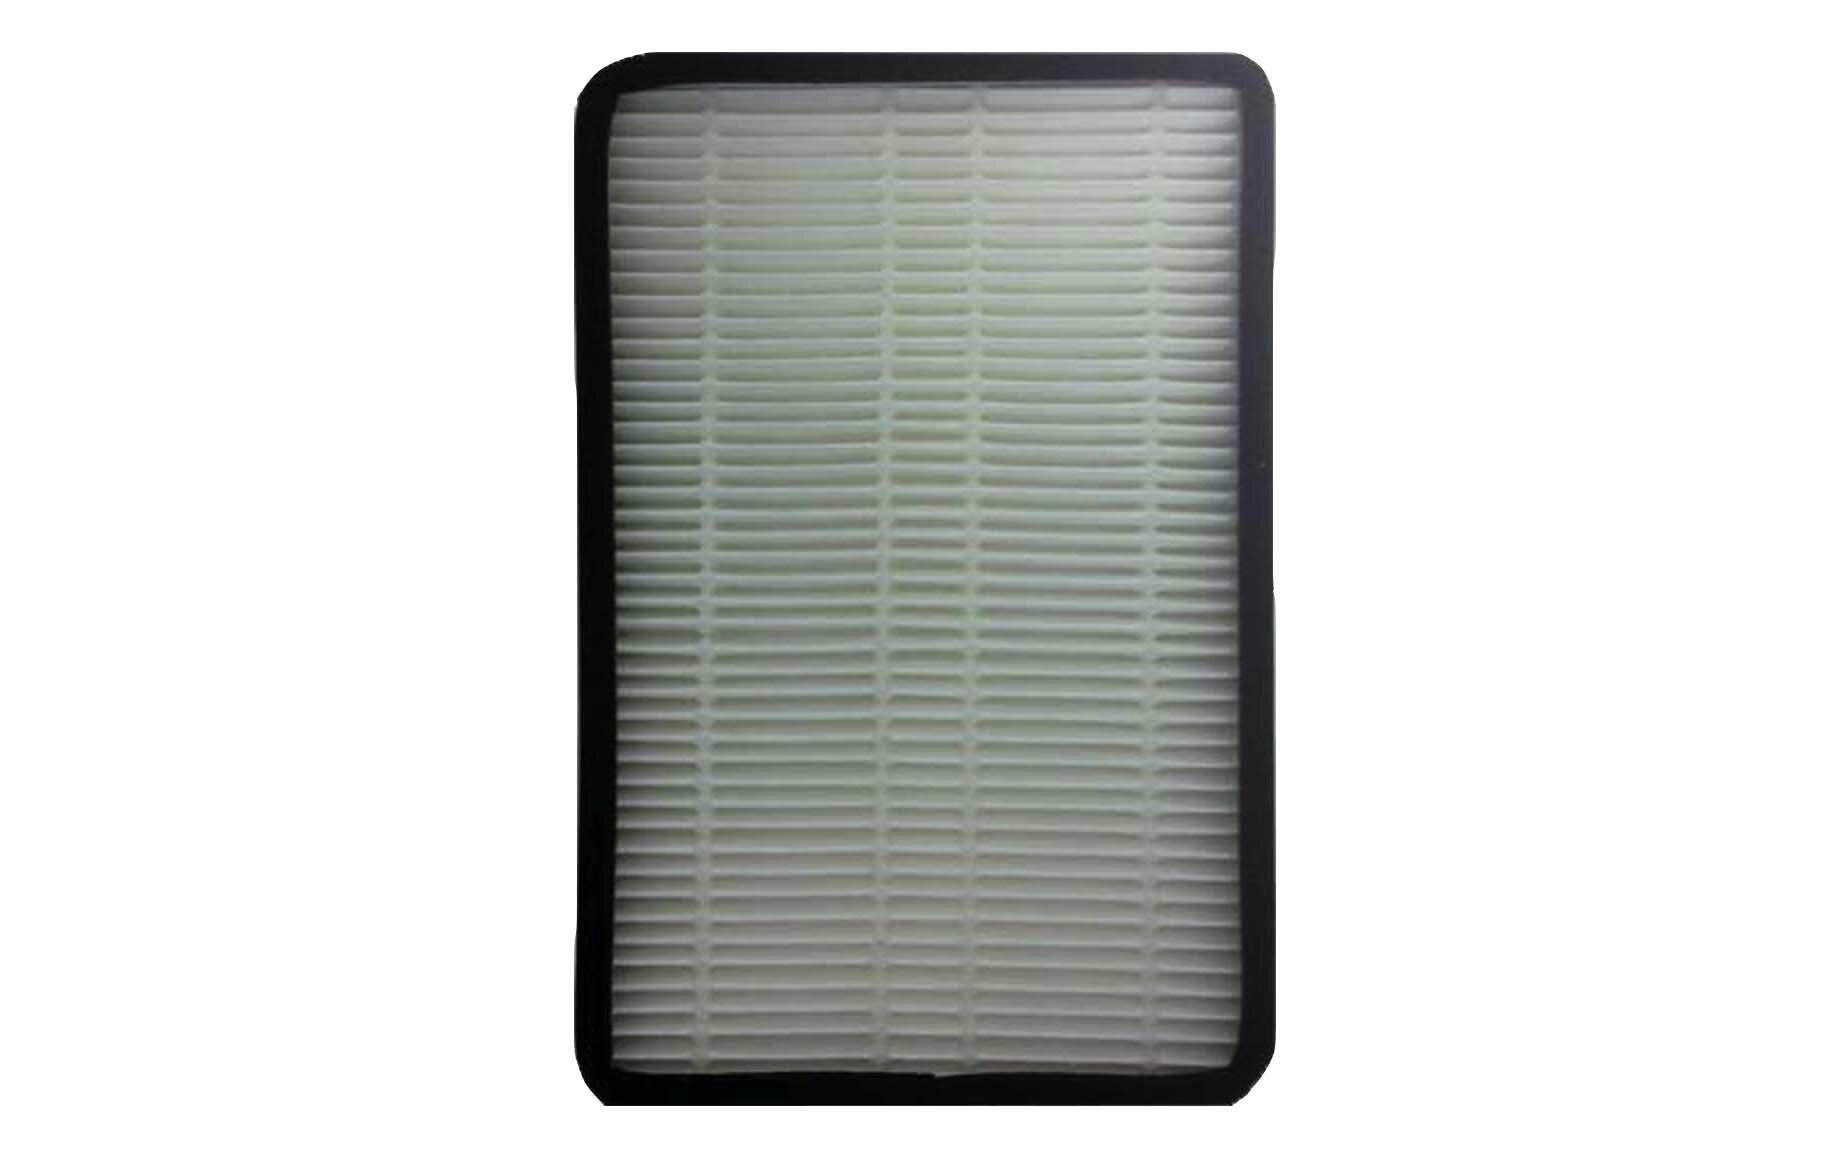 Crucial Think Crucial Ef1 Hepa Exhaust Filter Wayfair